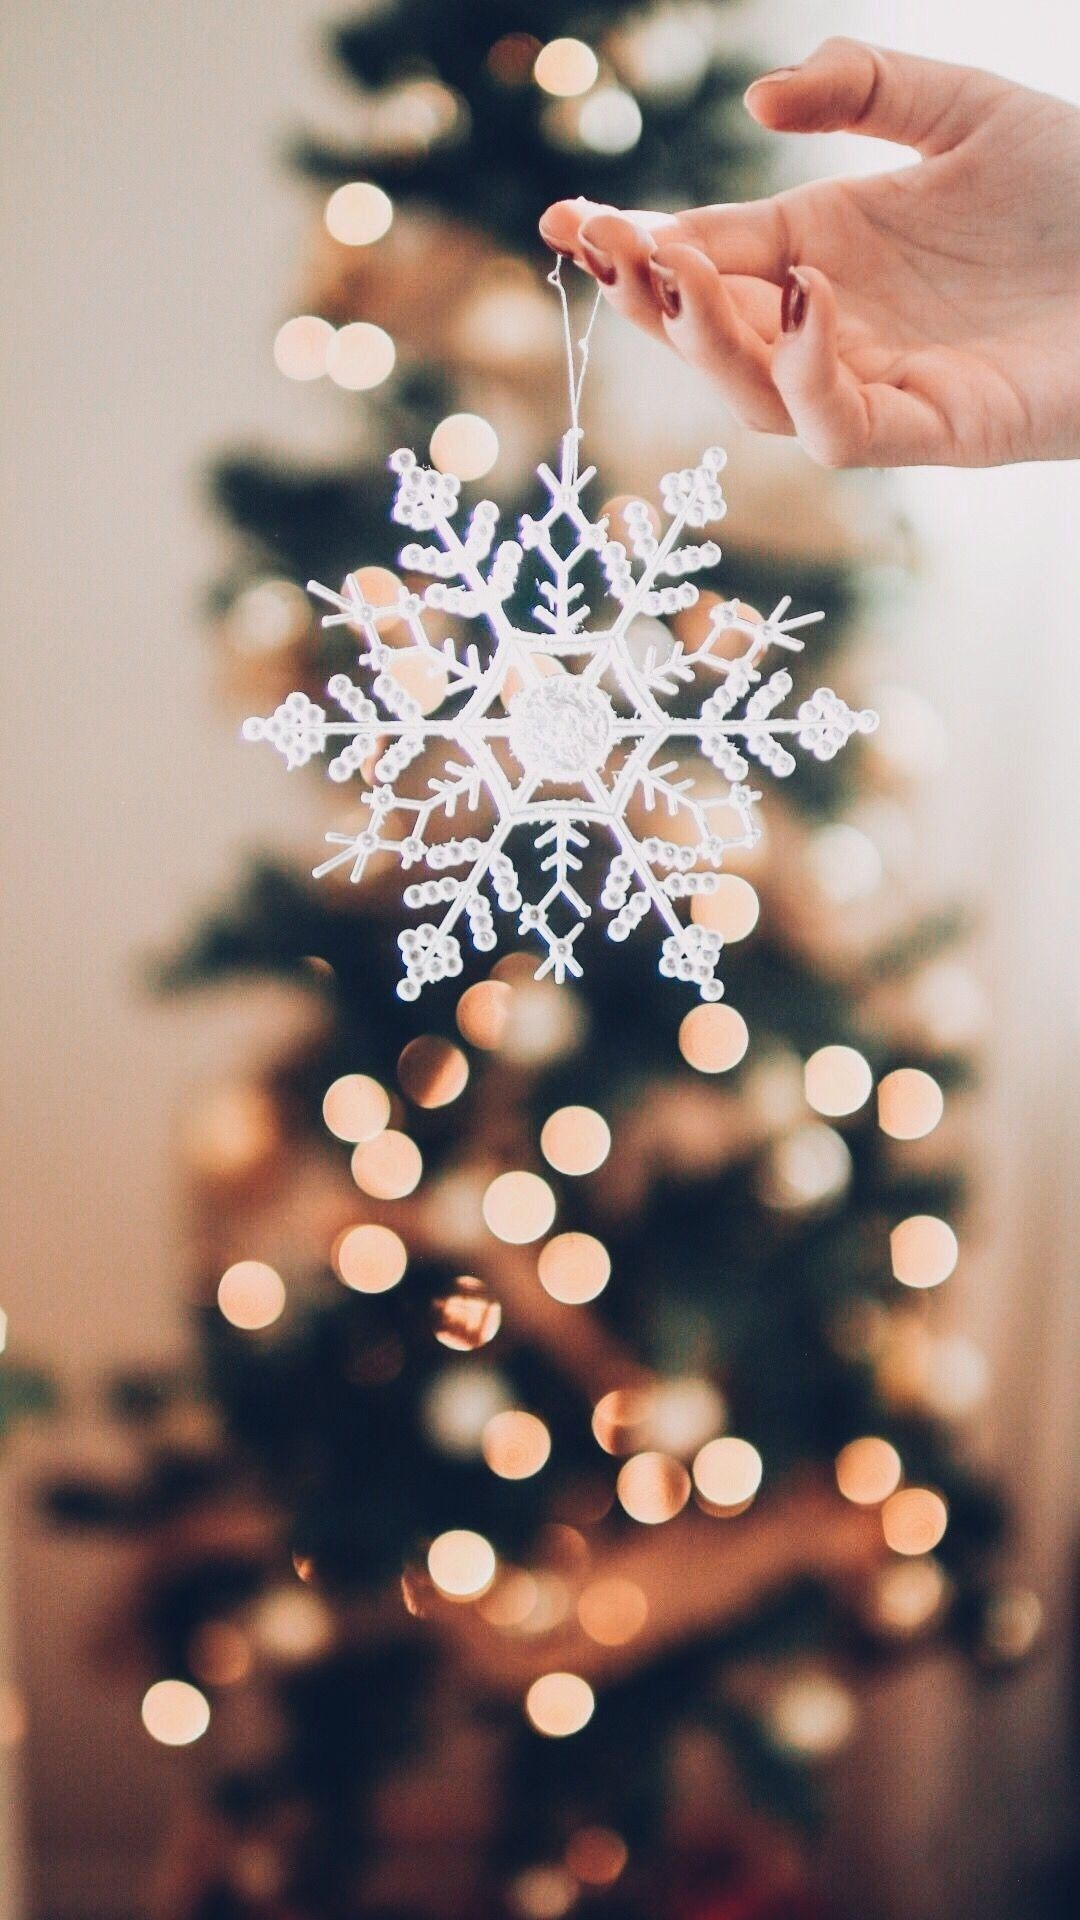 Pin By Ivana Mackovic On Zima Novyj God Wallpaper Iphone Christmas Winter Wonderland Christmas Christmas Aesthetic